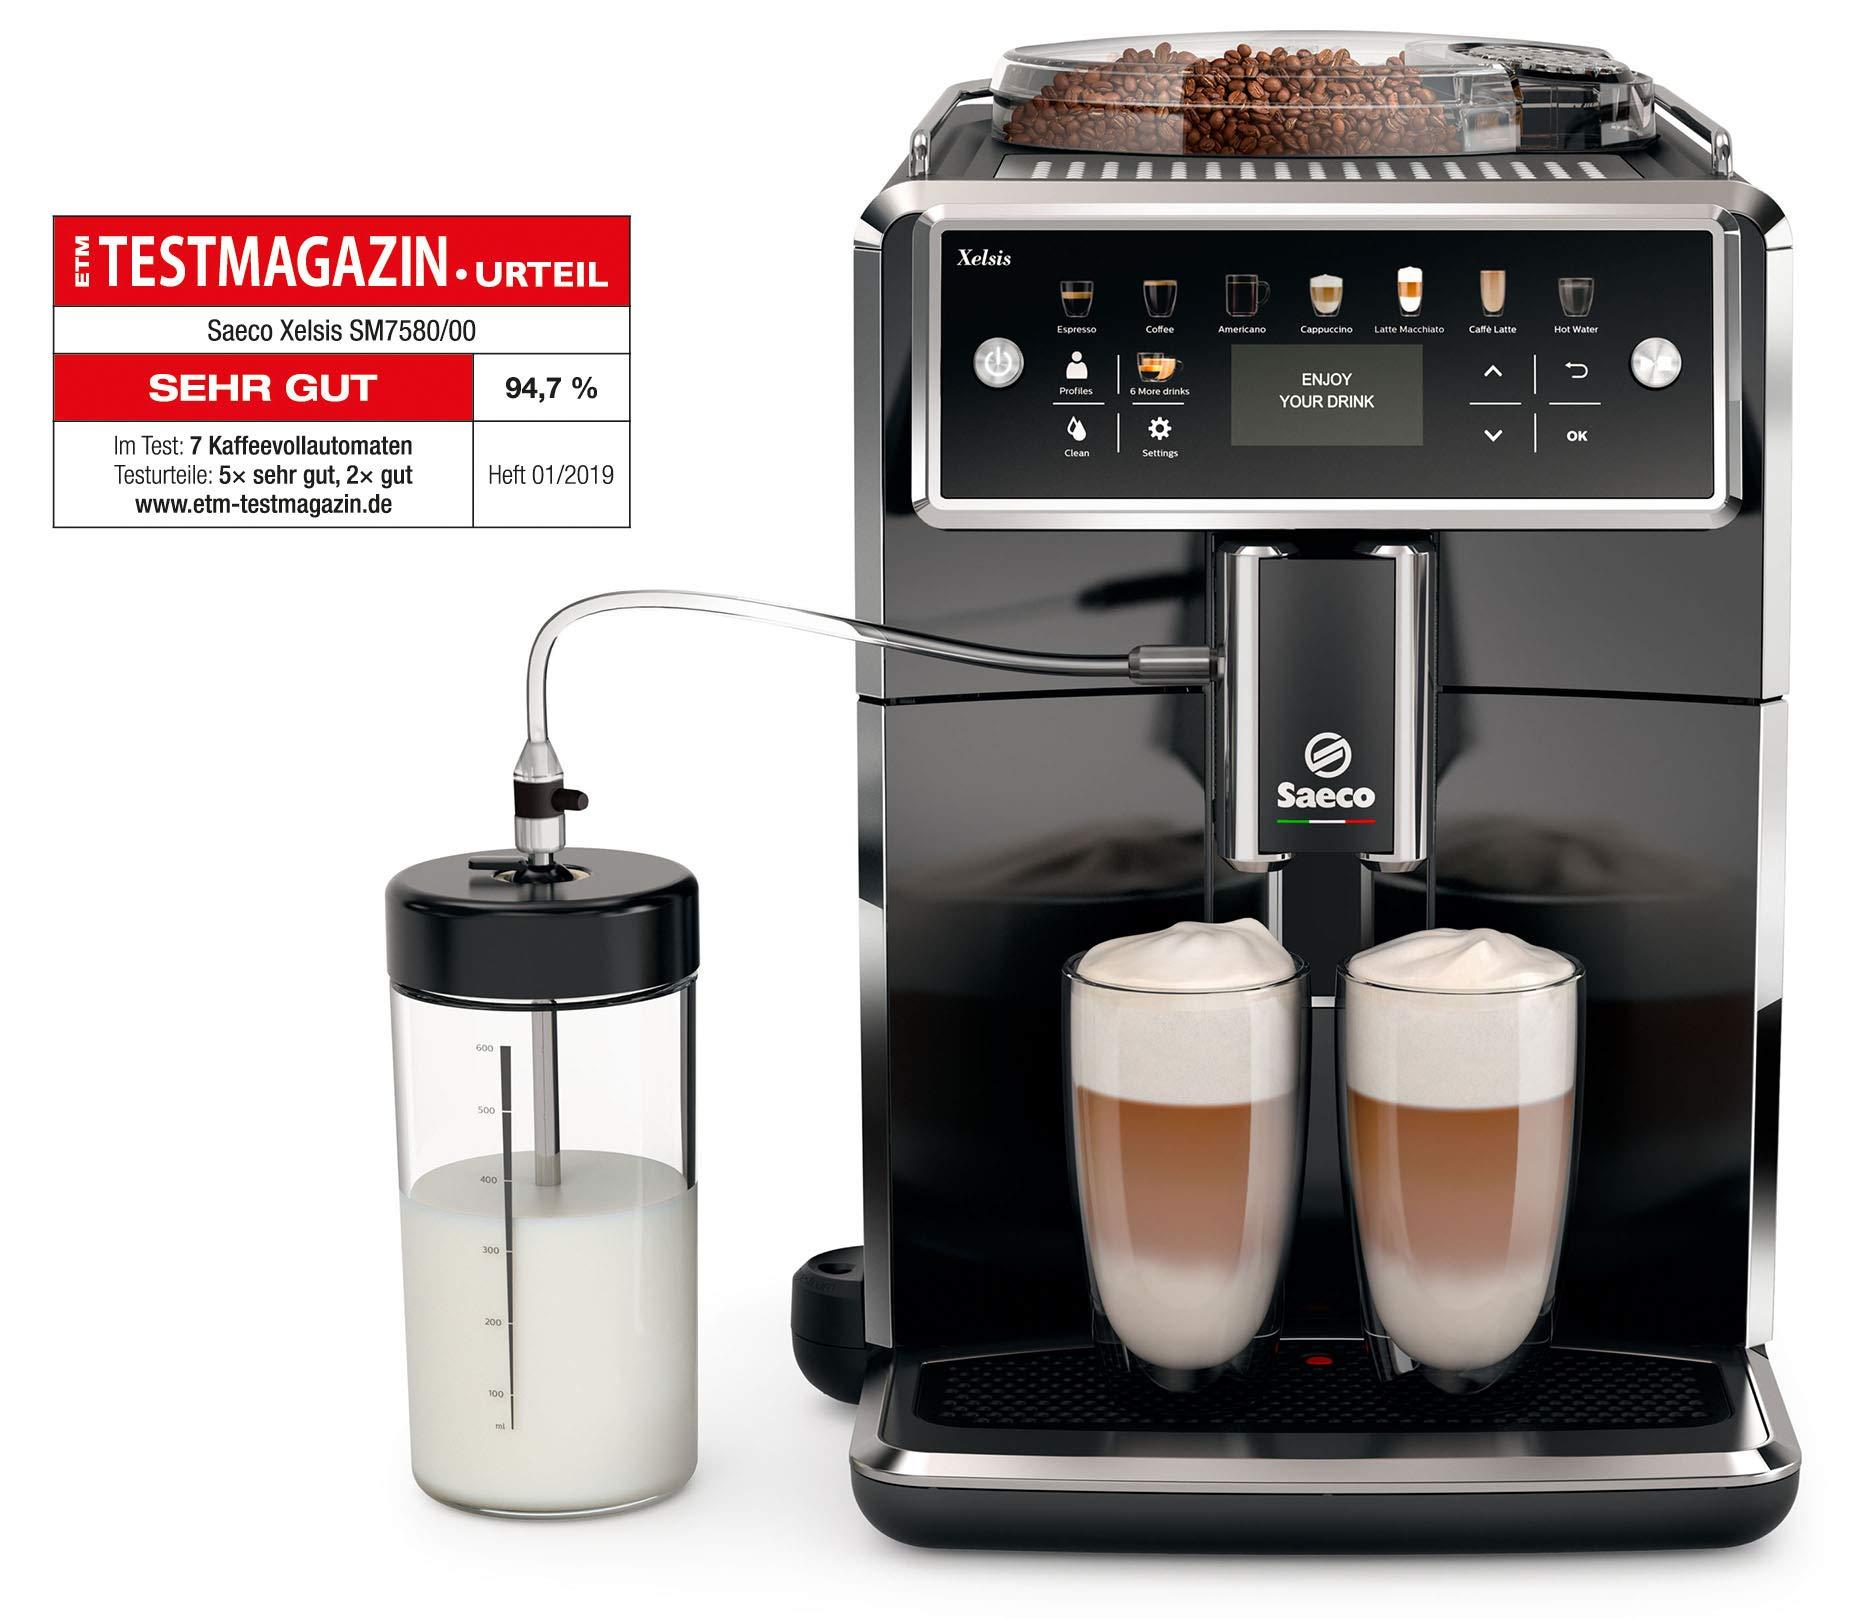 Saeco SM7580/00 Xelsis Kaffeevollautomat (LED Display, Milchbehälter) pianoschwarz